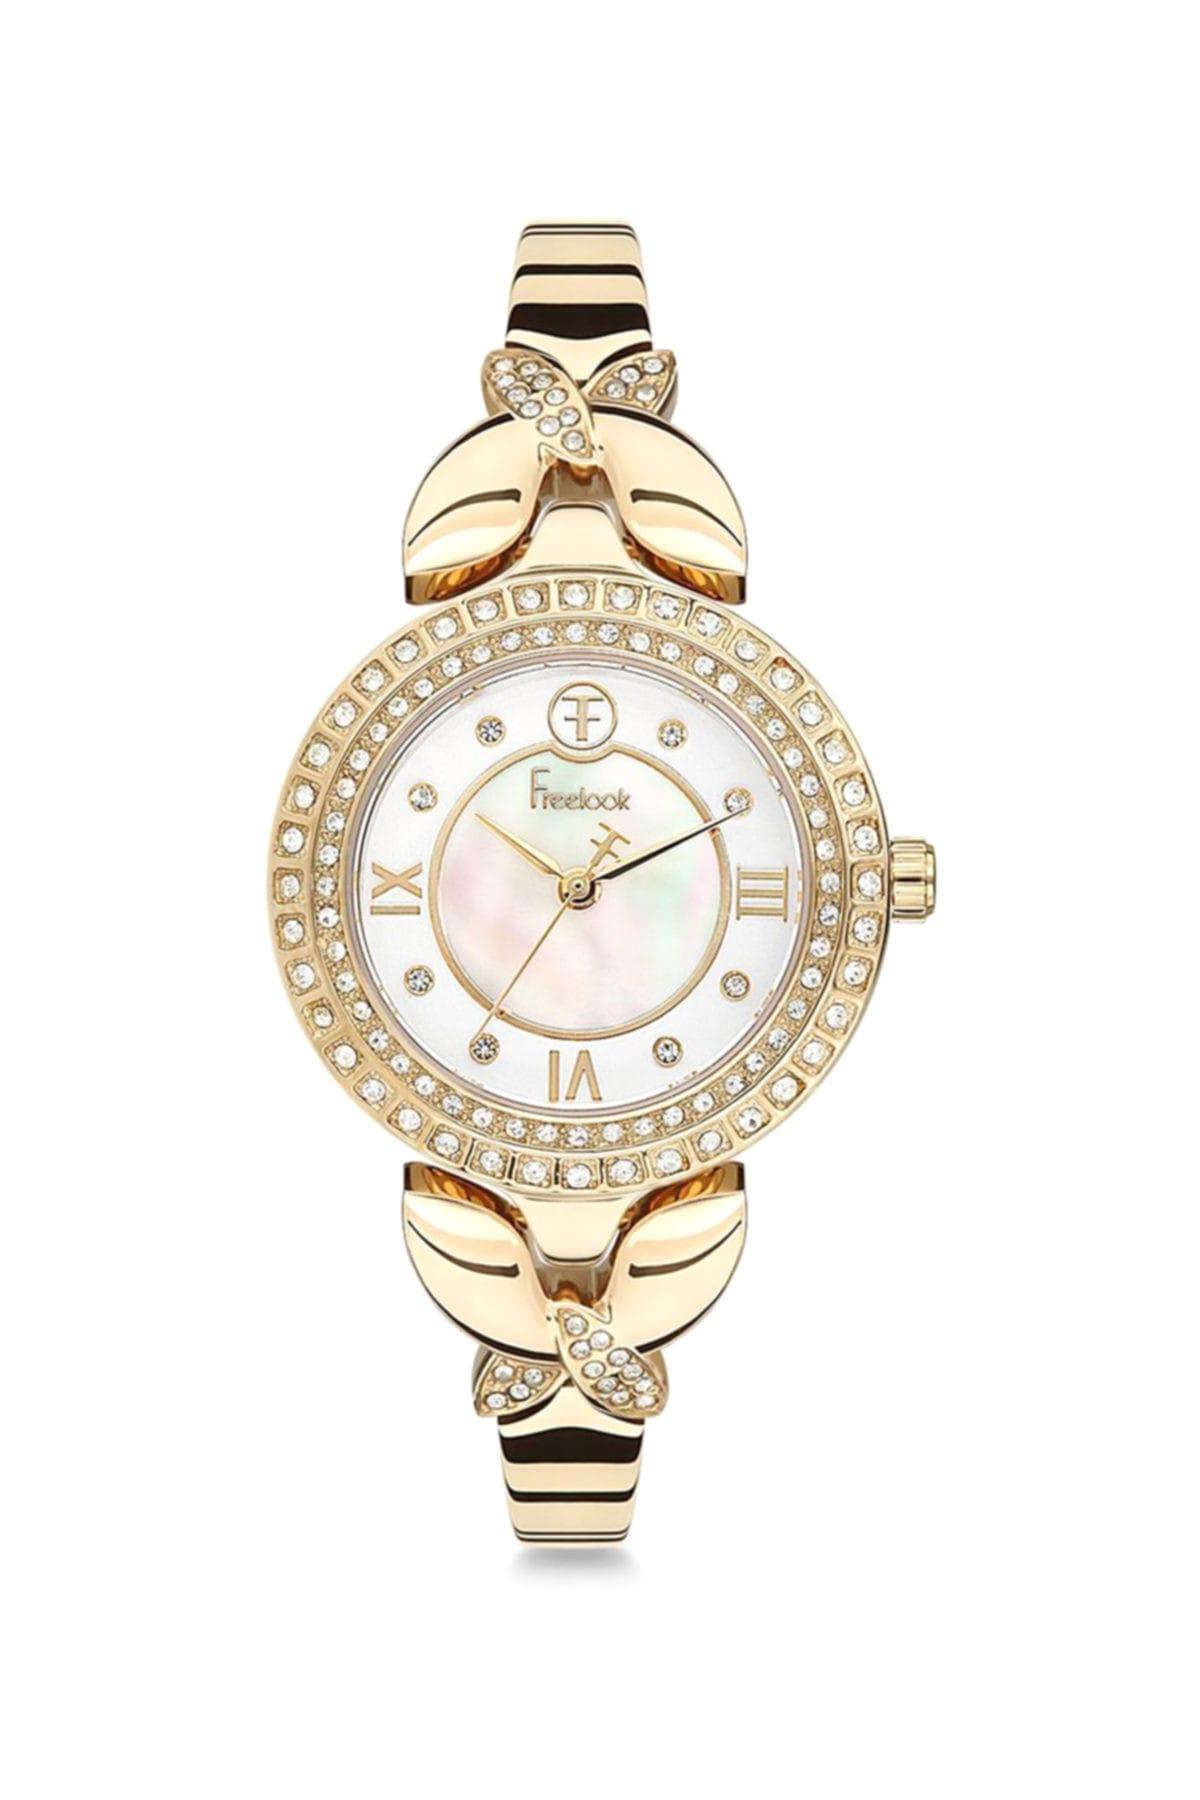 Women Wrist watch Butterfly Design Wristwatch Clock